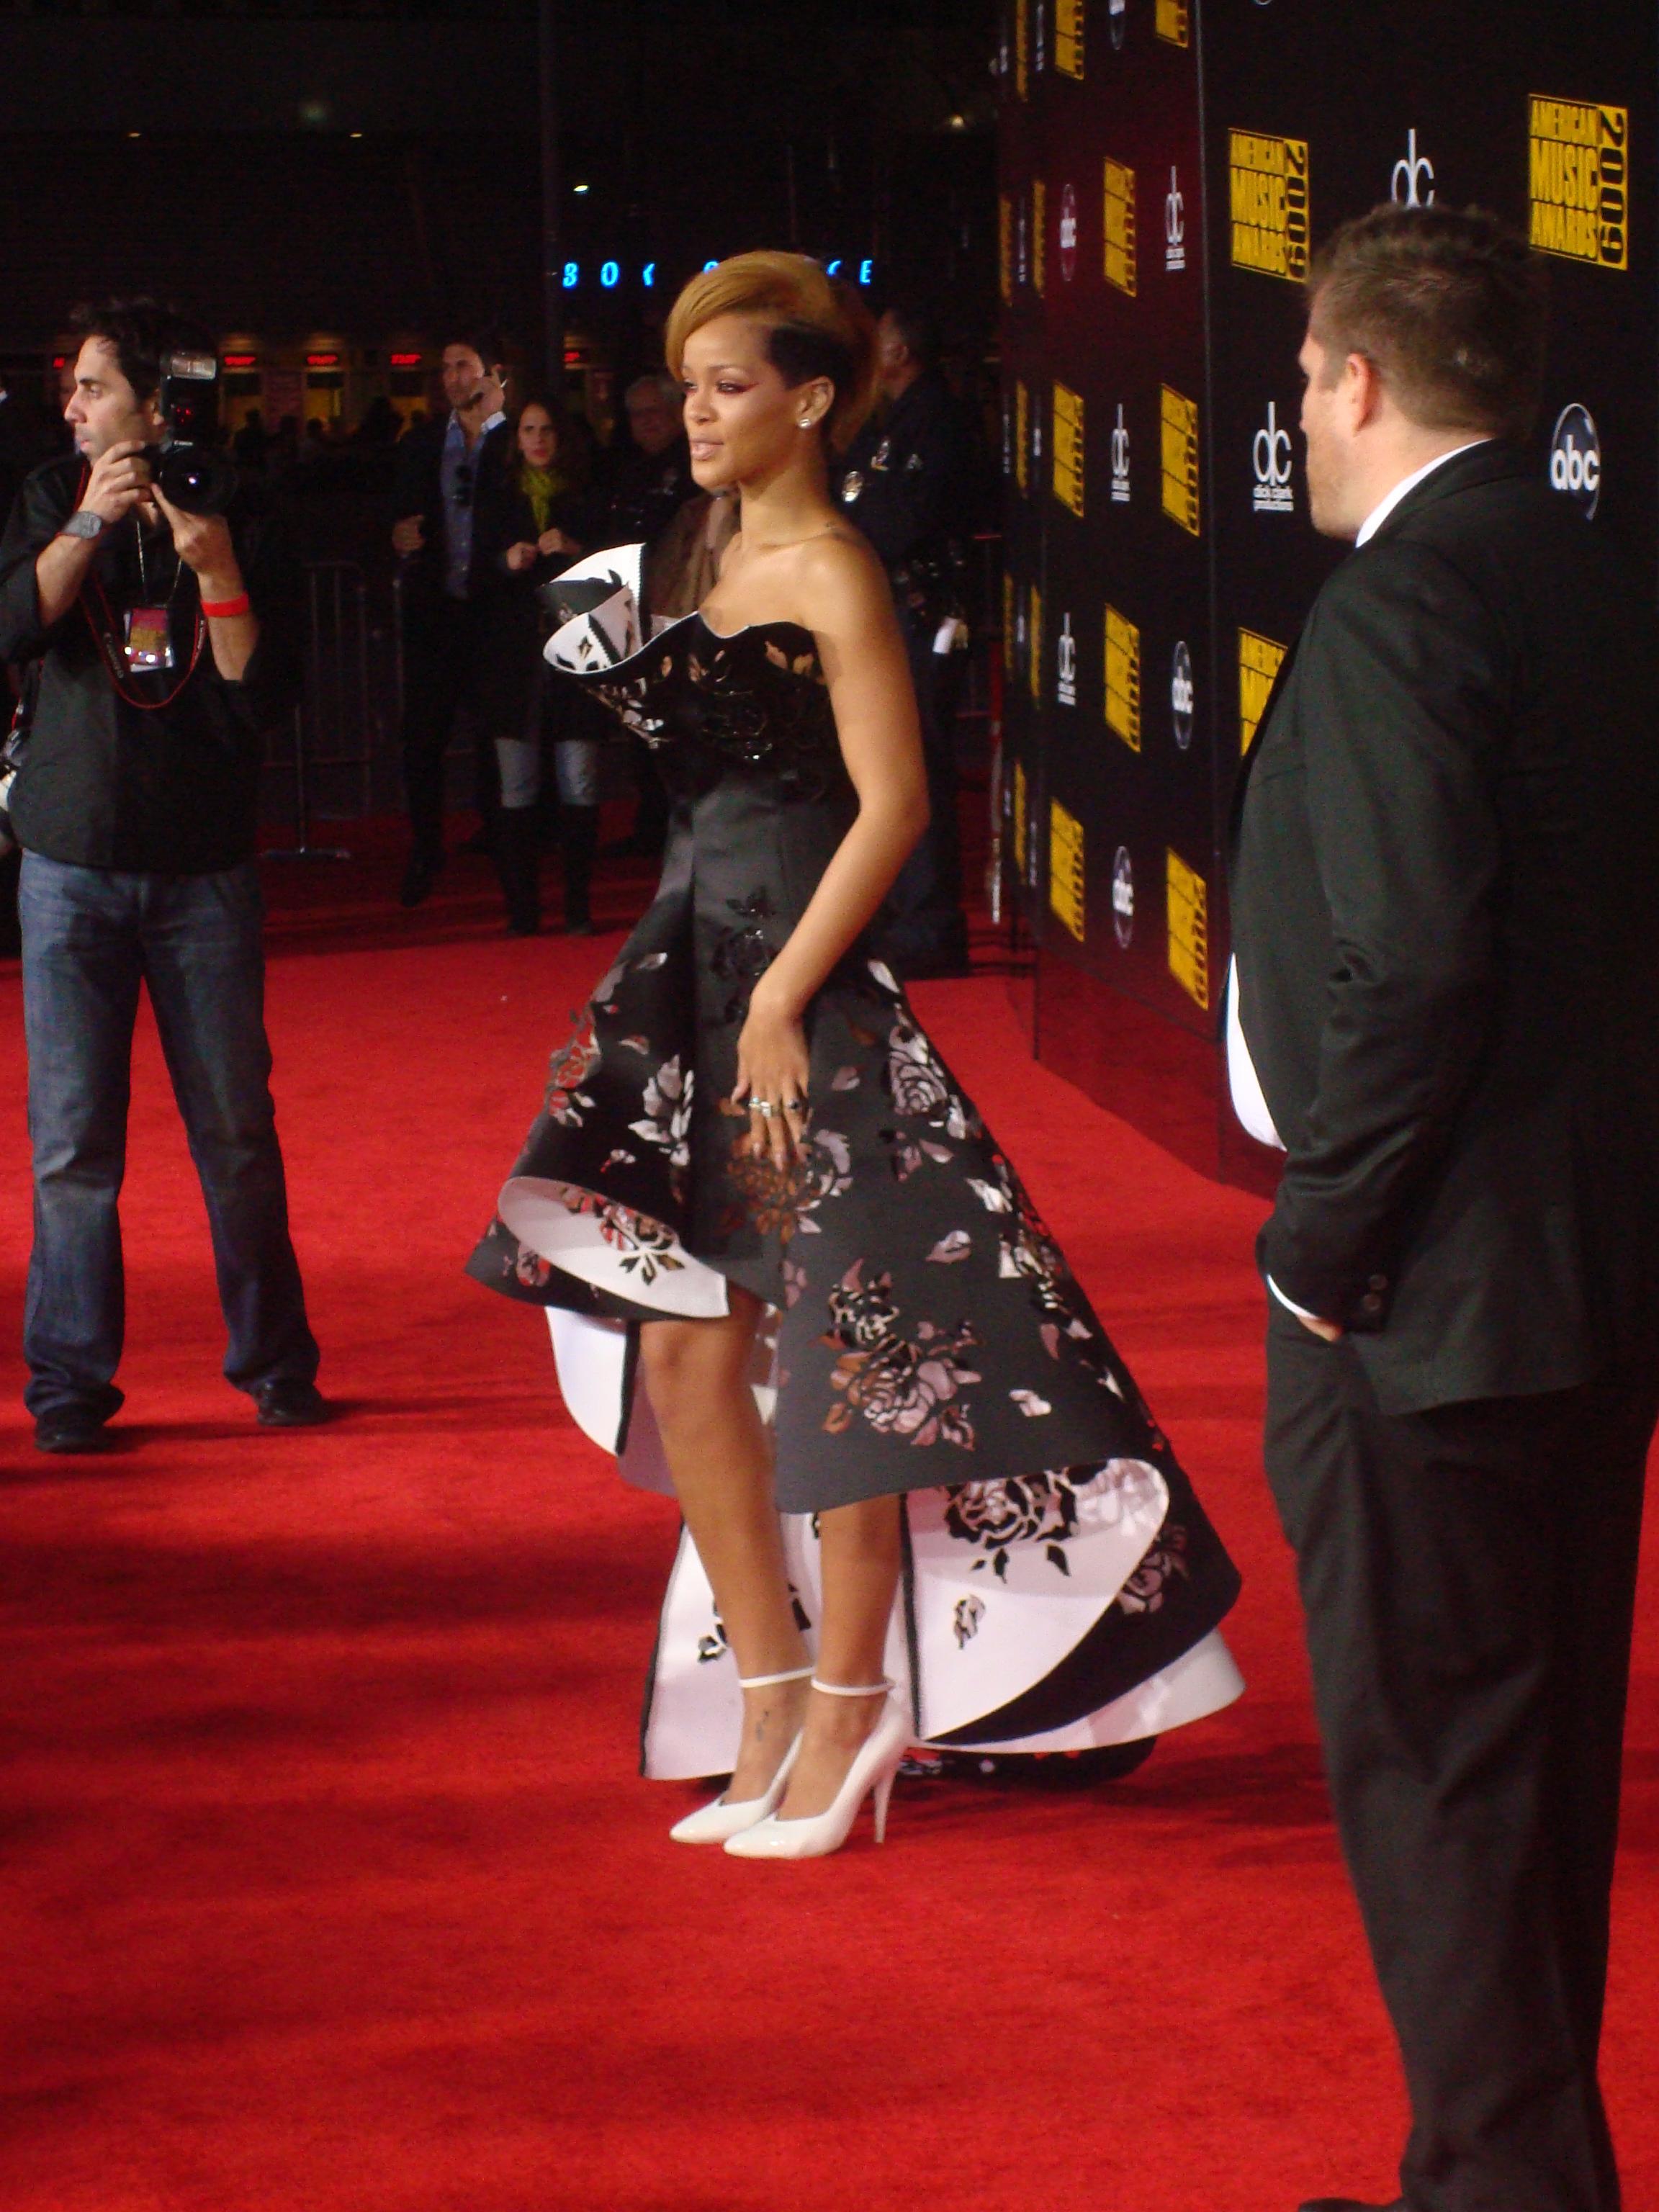 Image Result For Rihanna